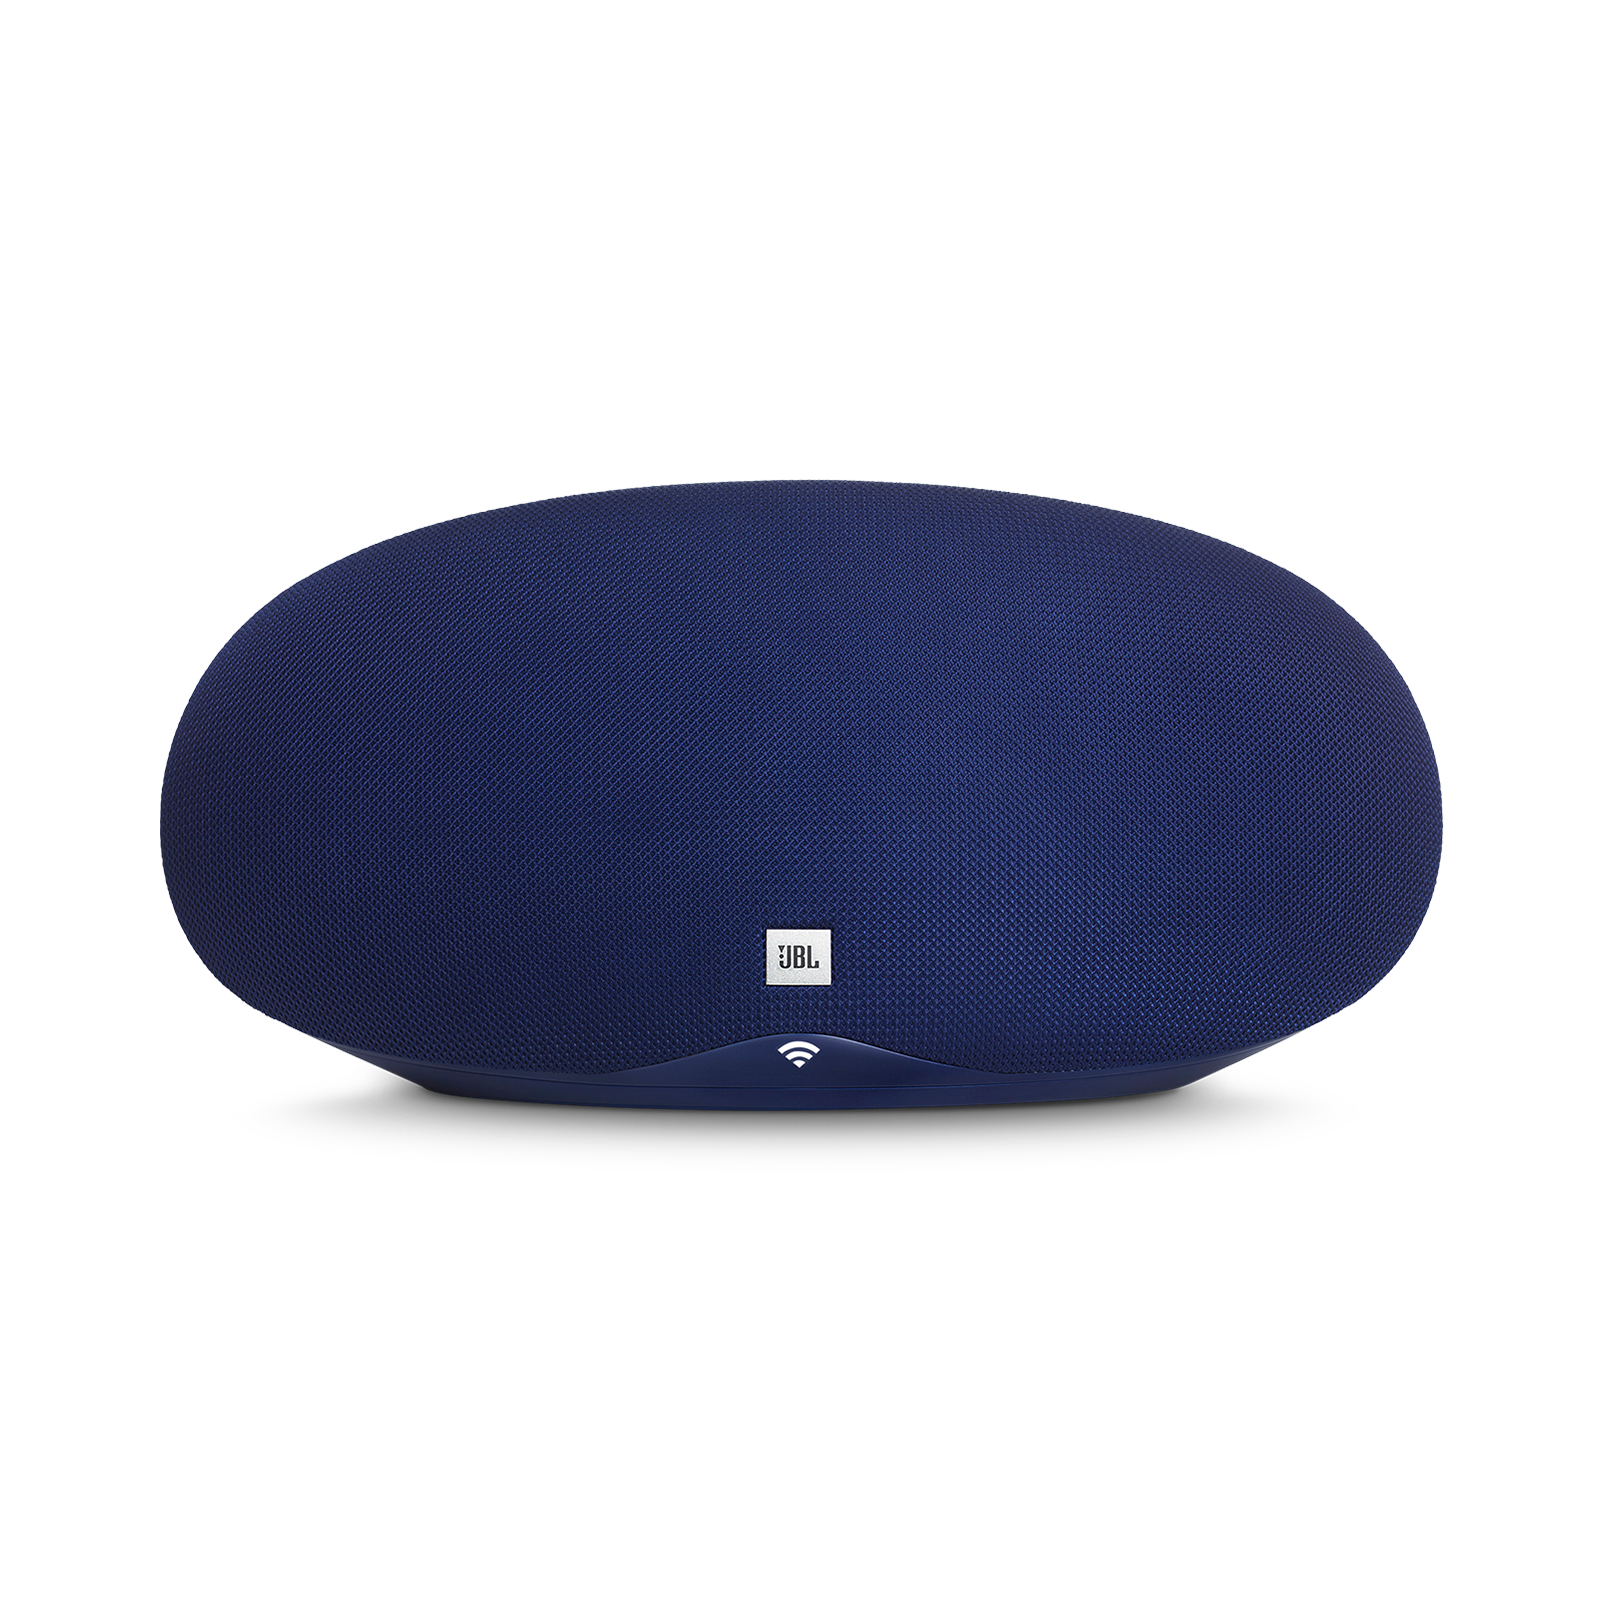 JBL Playlist - Blue - Wireless speaker with Chromecast built-in - Front